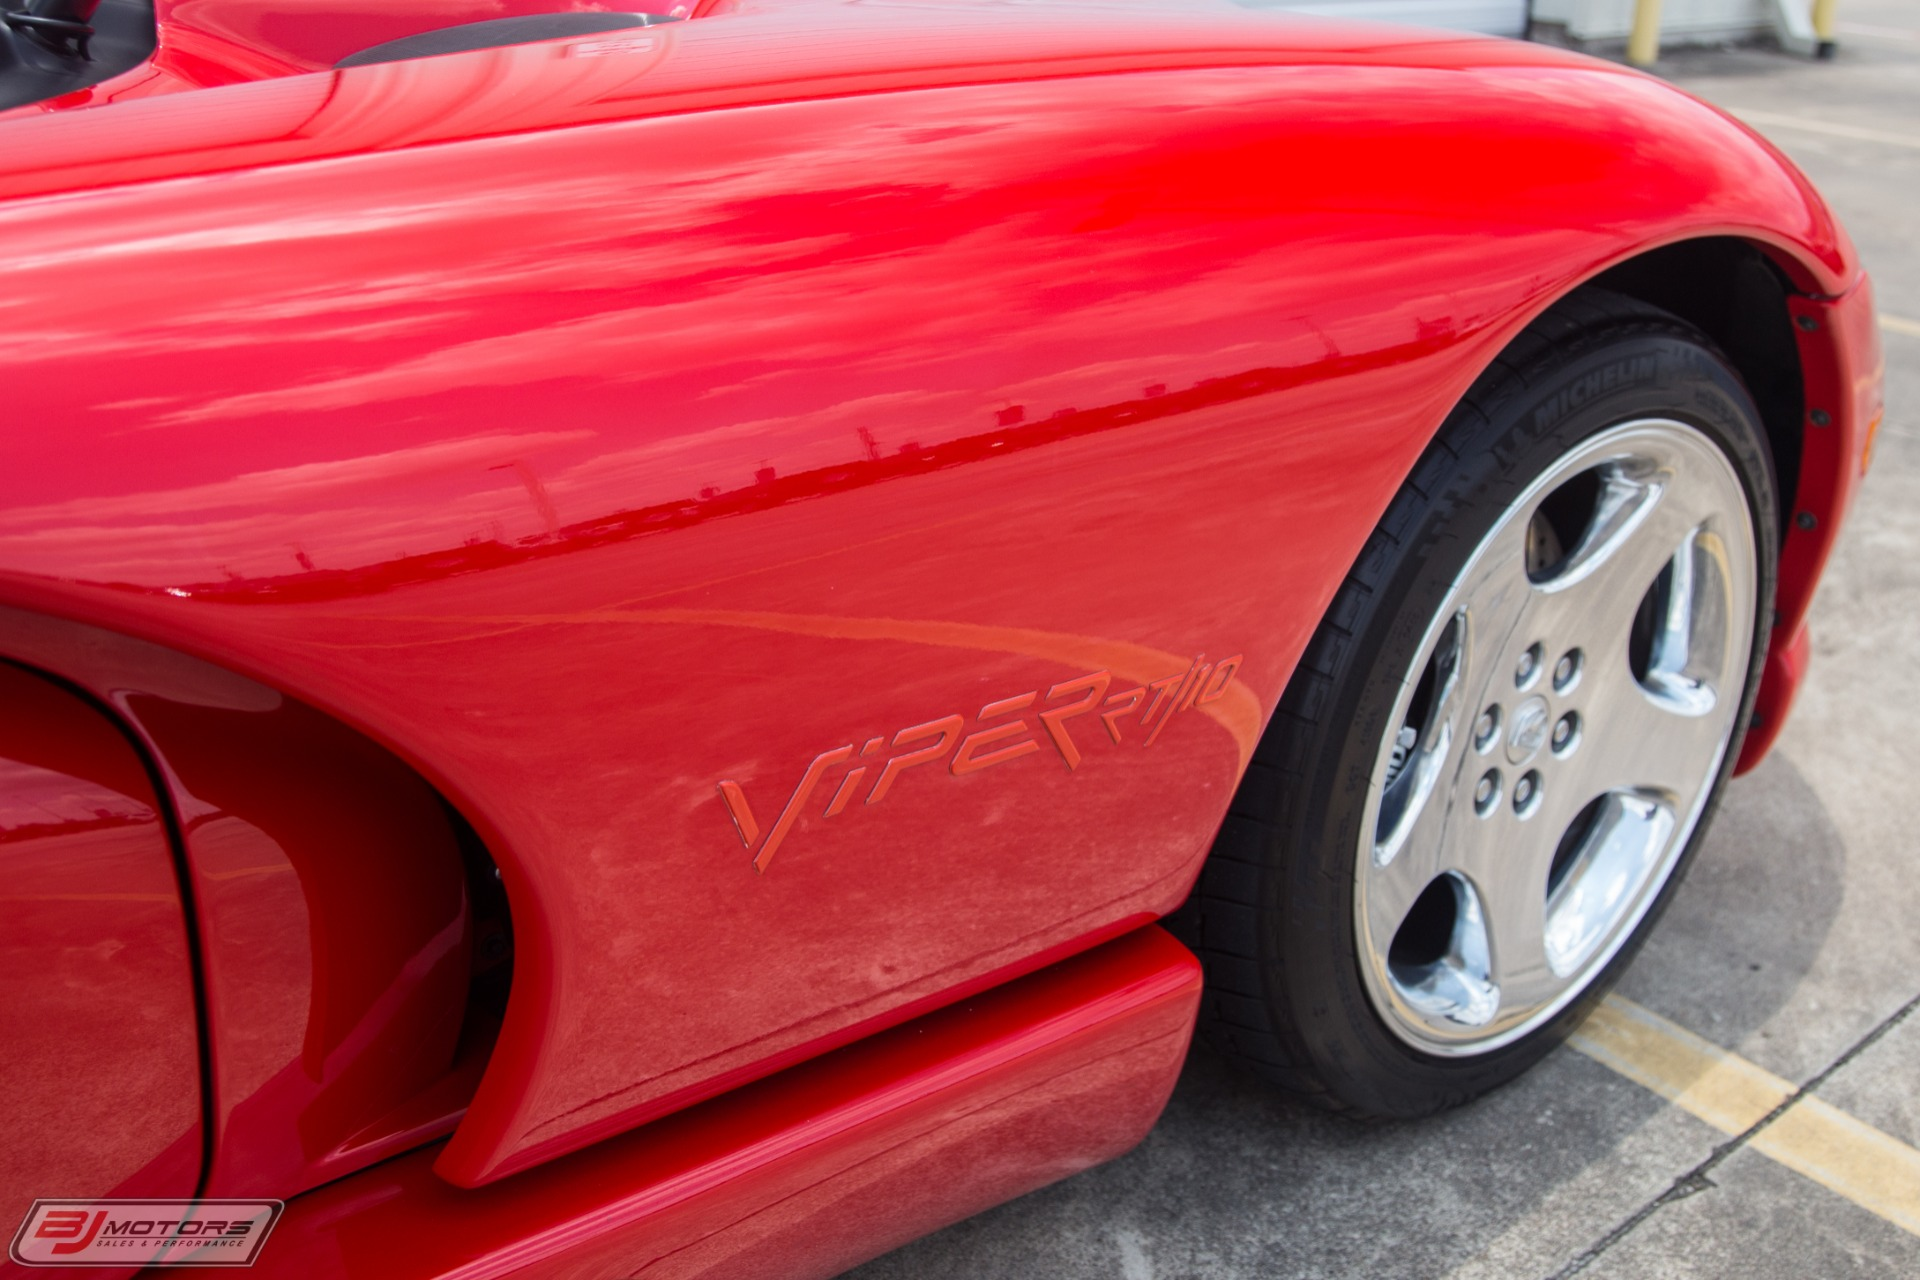 Used-1994-Dodge-Viper-RT/10